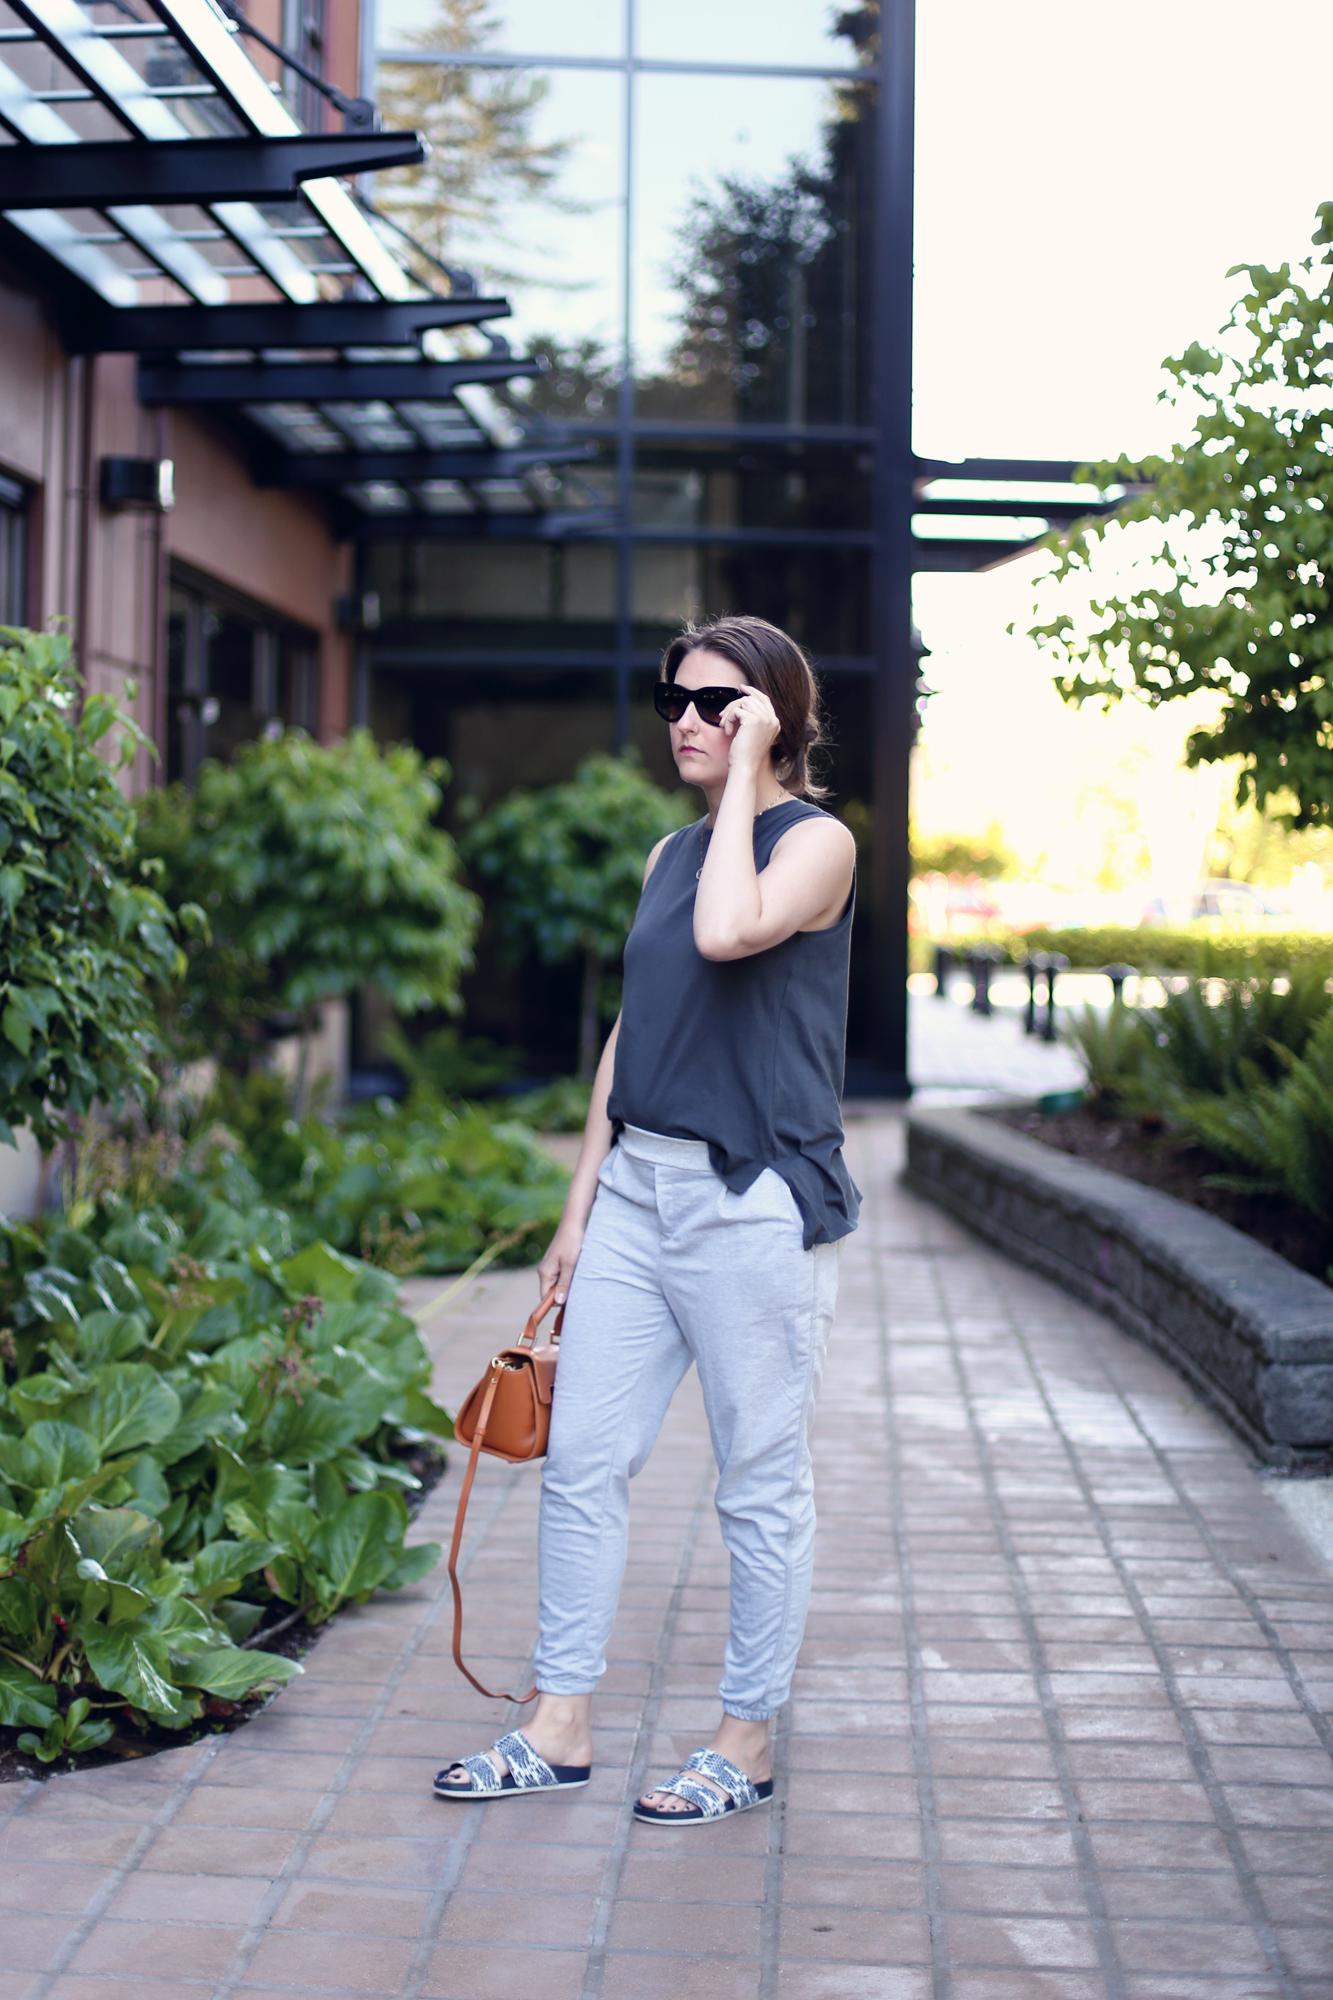 My favourite lazy outfit: grey sweatpants, sandals, a Mezzi bag, and black sunglasses.